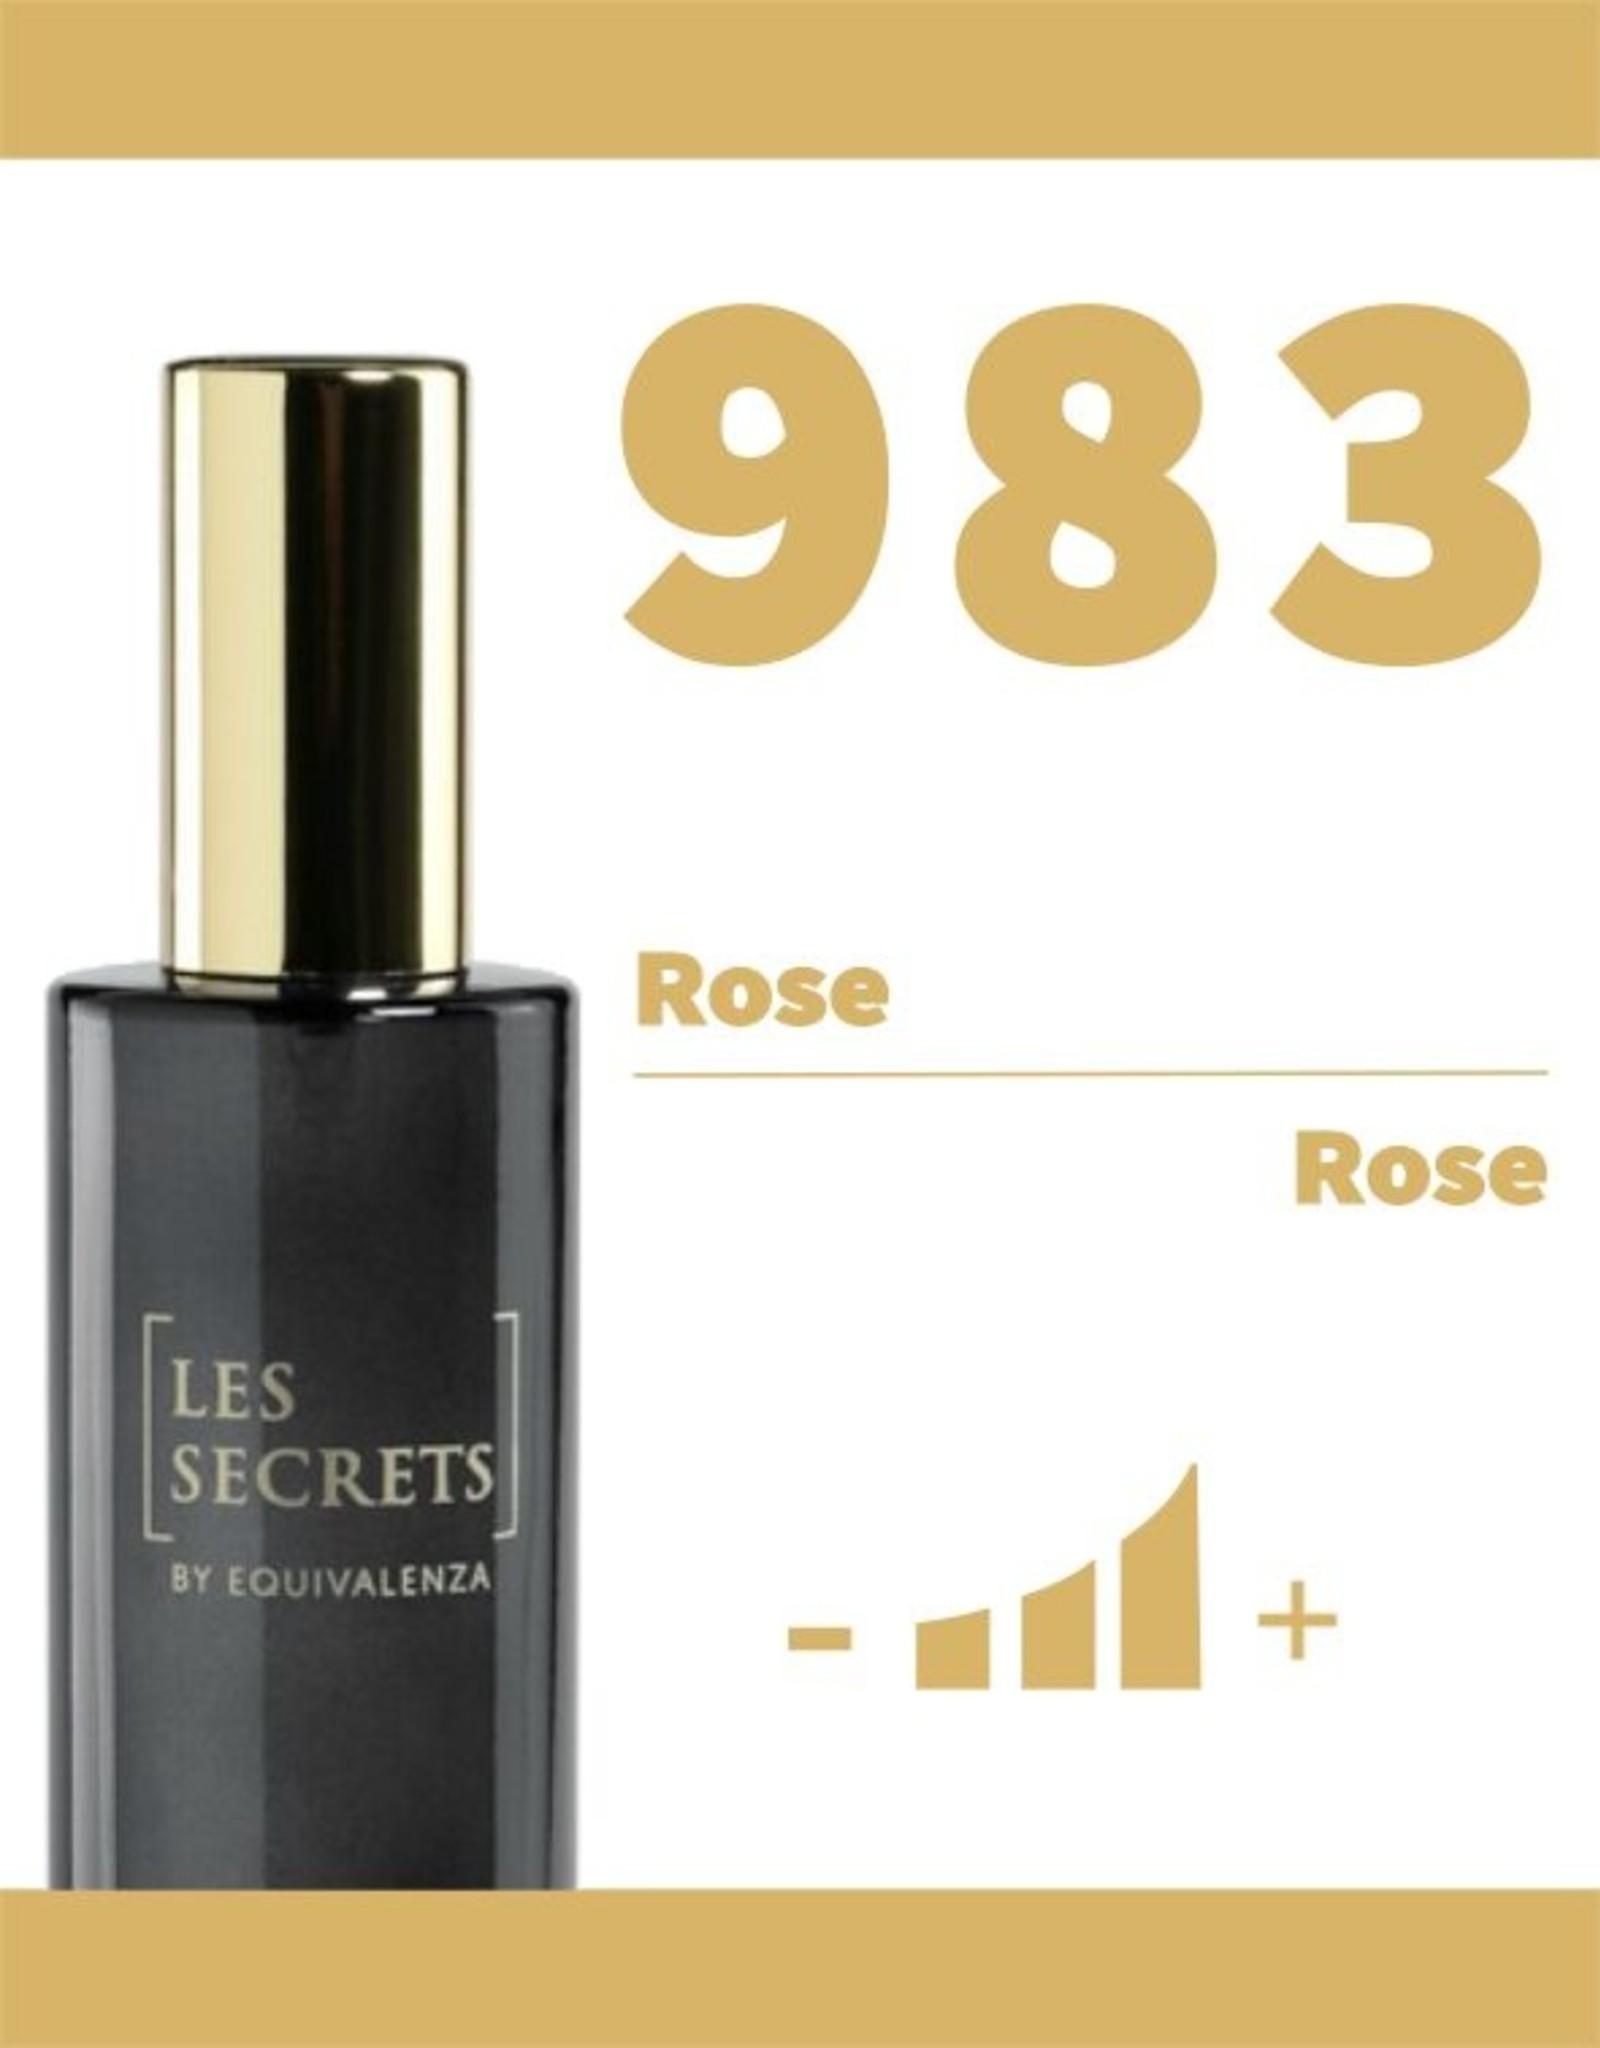 Equivalenza Rose 983